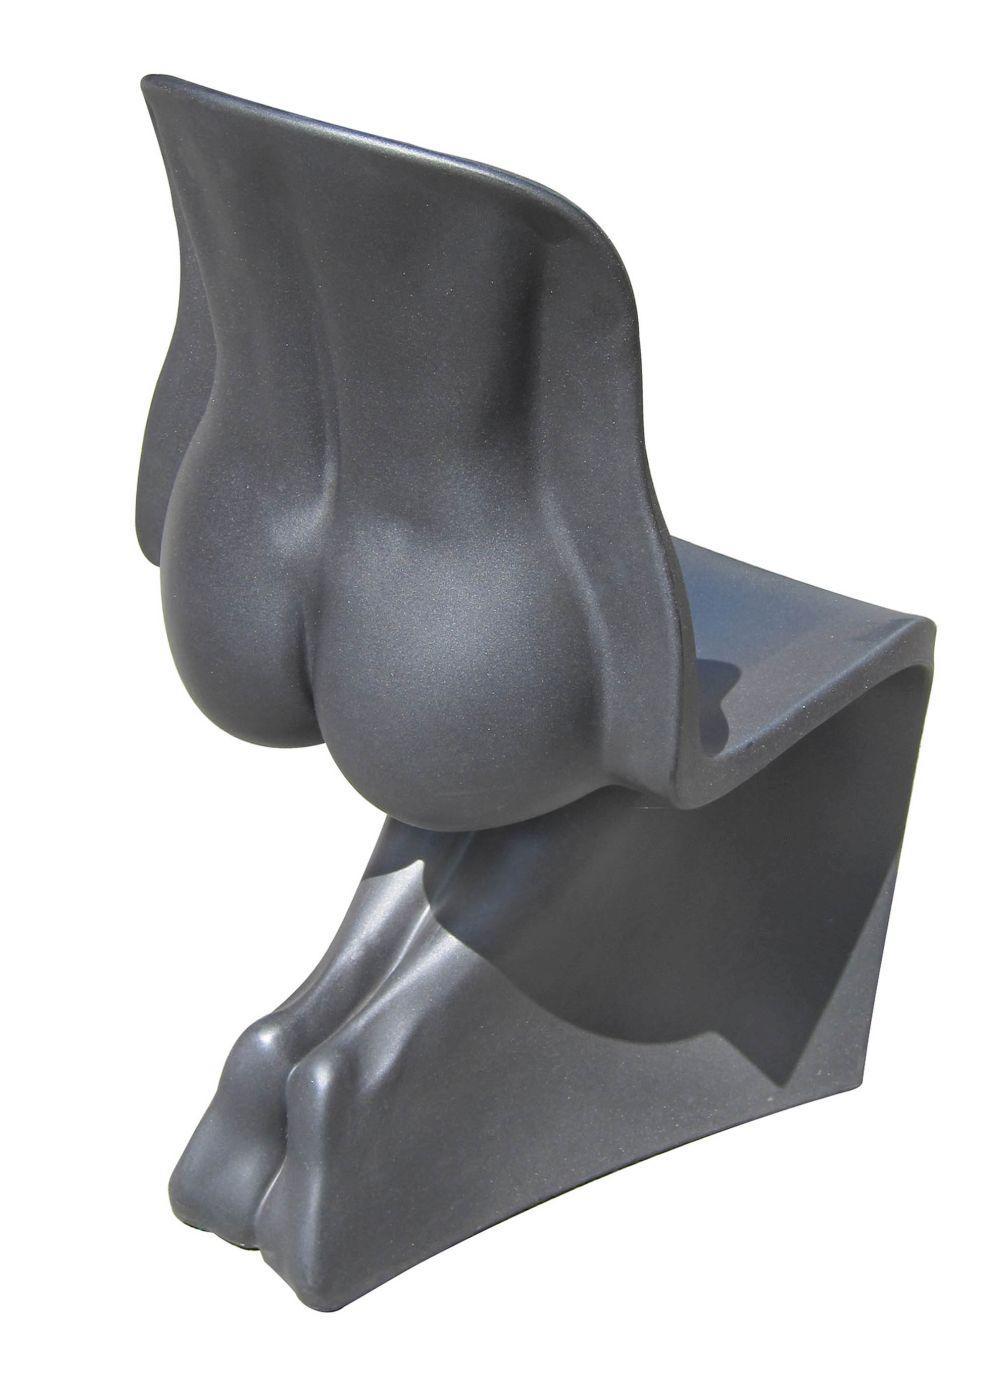 """Her"" chair designed by Fabio Novembre"